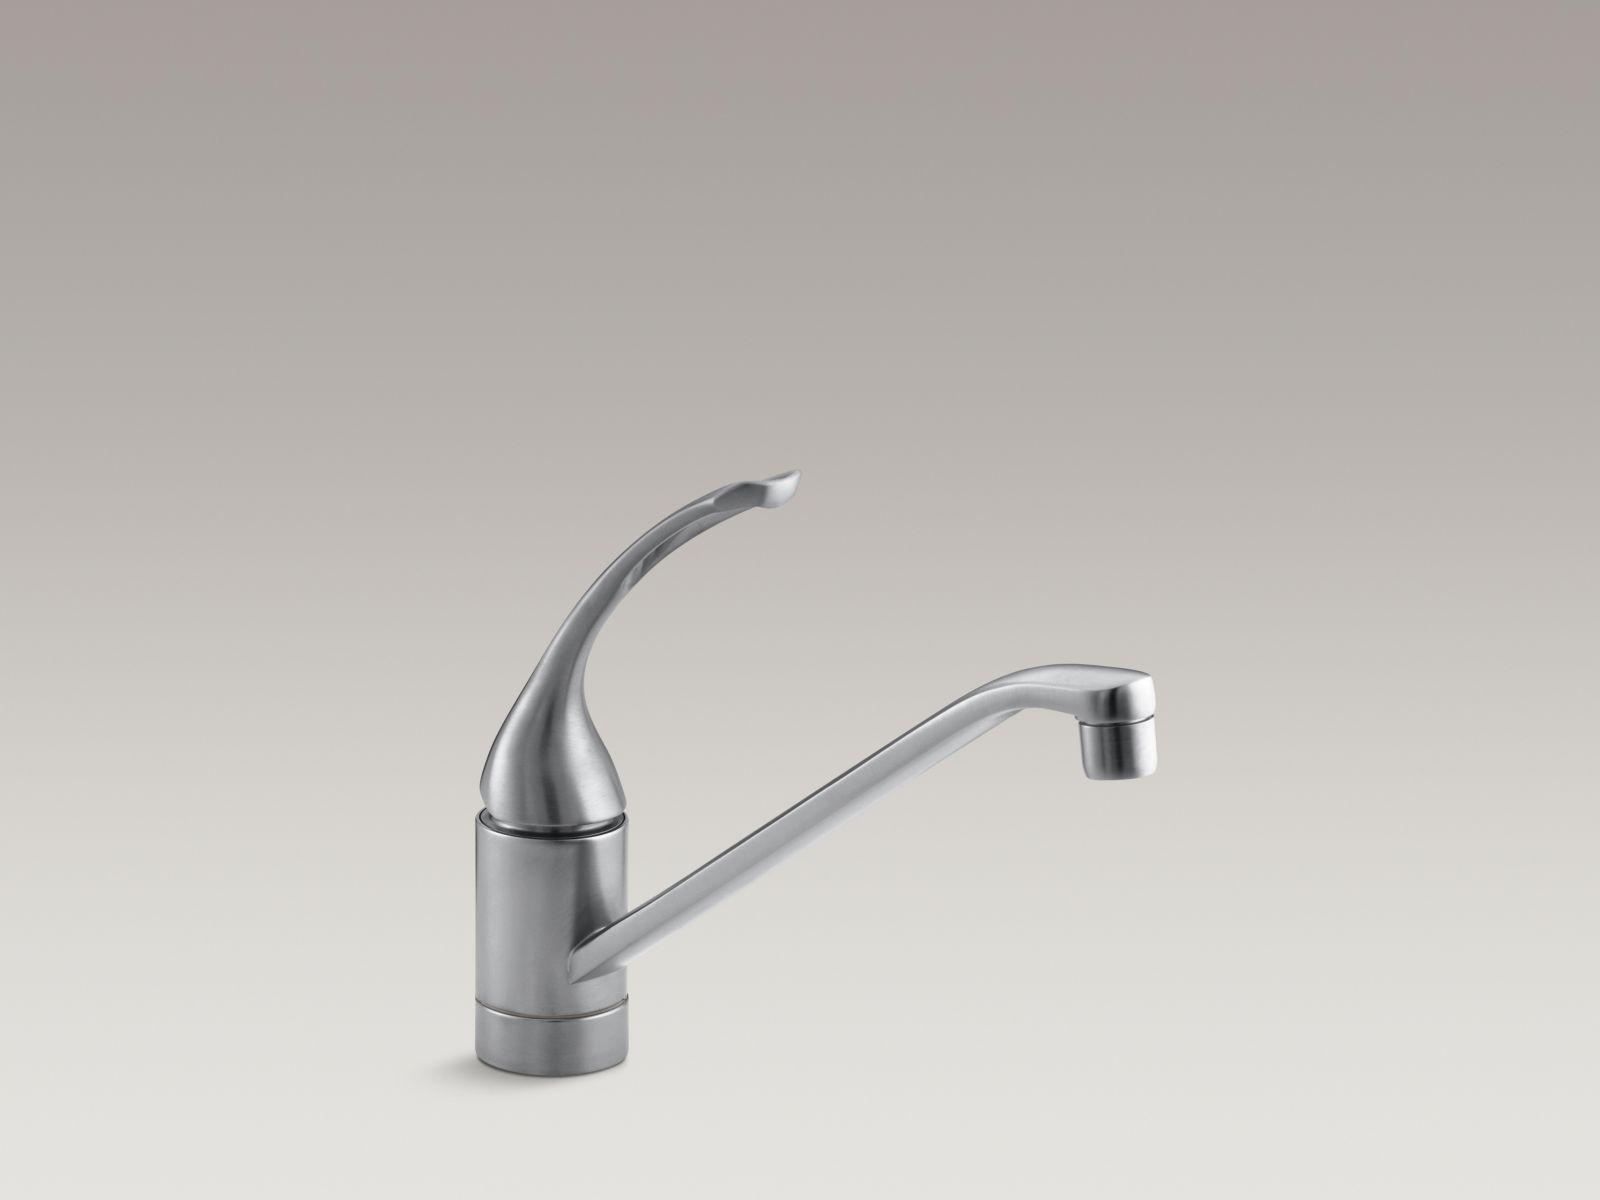 "Kohler K-15175-FL-G Coralais Single-handle Kitchen Faucet with 10"" Spout and Loop Handle Brushed Chrome"